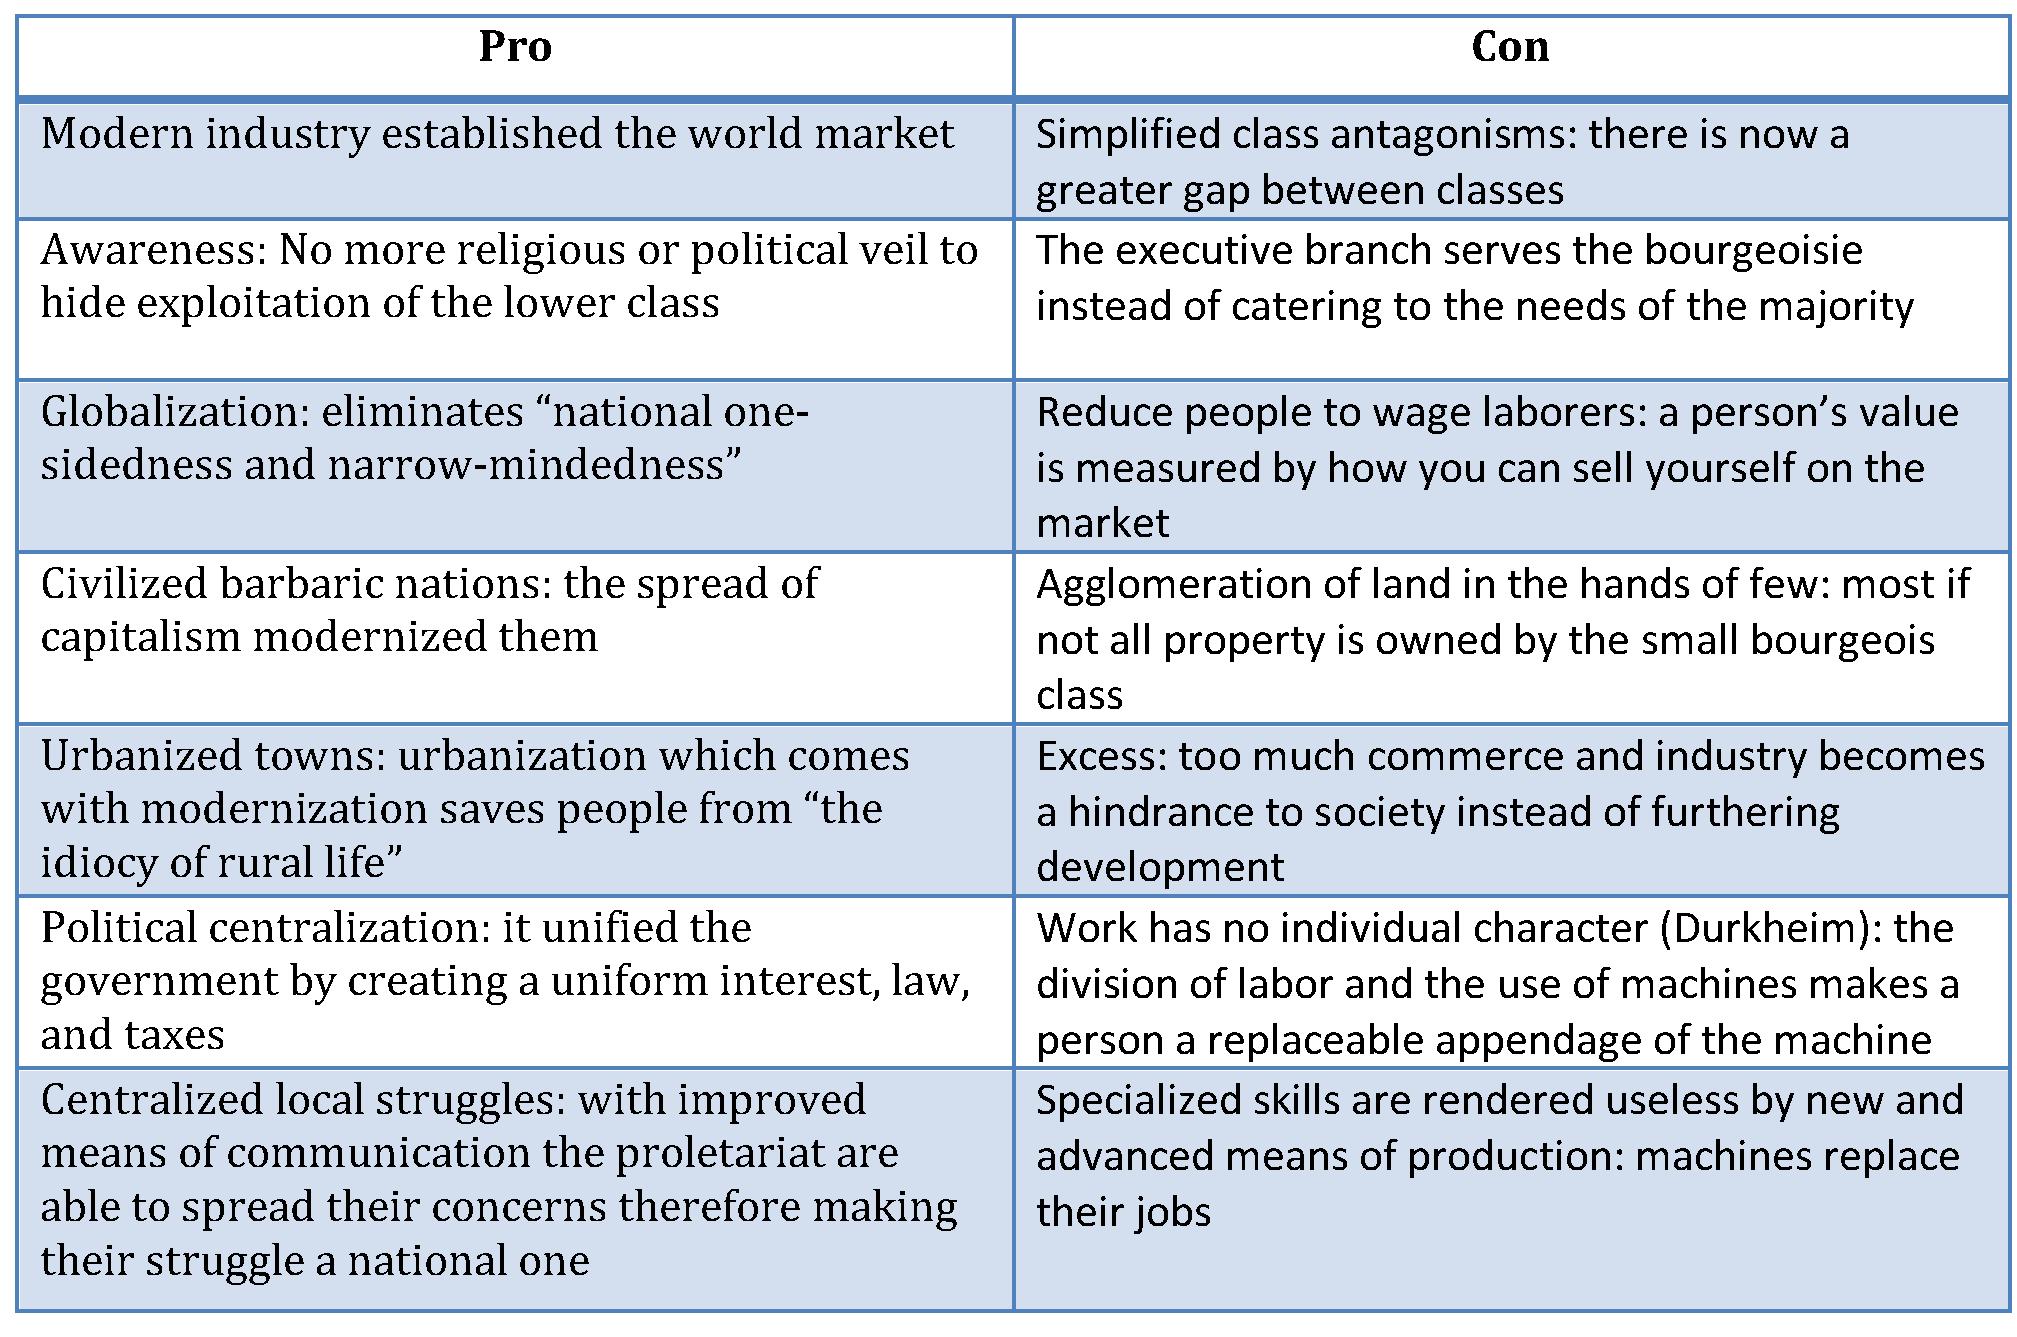 014 Essay Example Pro Death Penalty Fearsome Con Debate Argumentative Outline Full